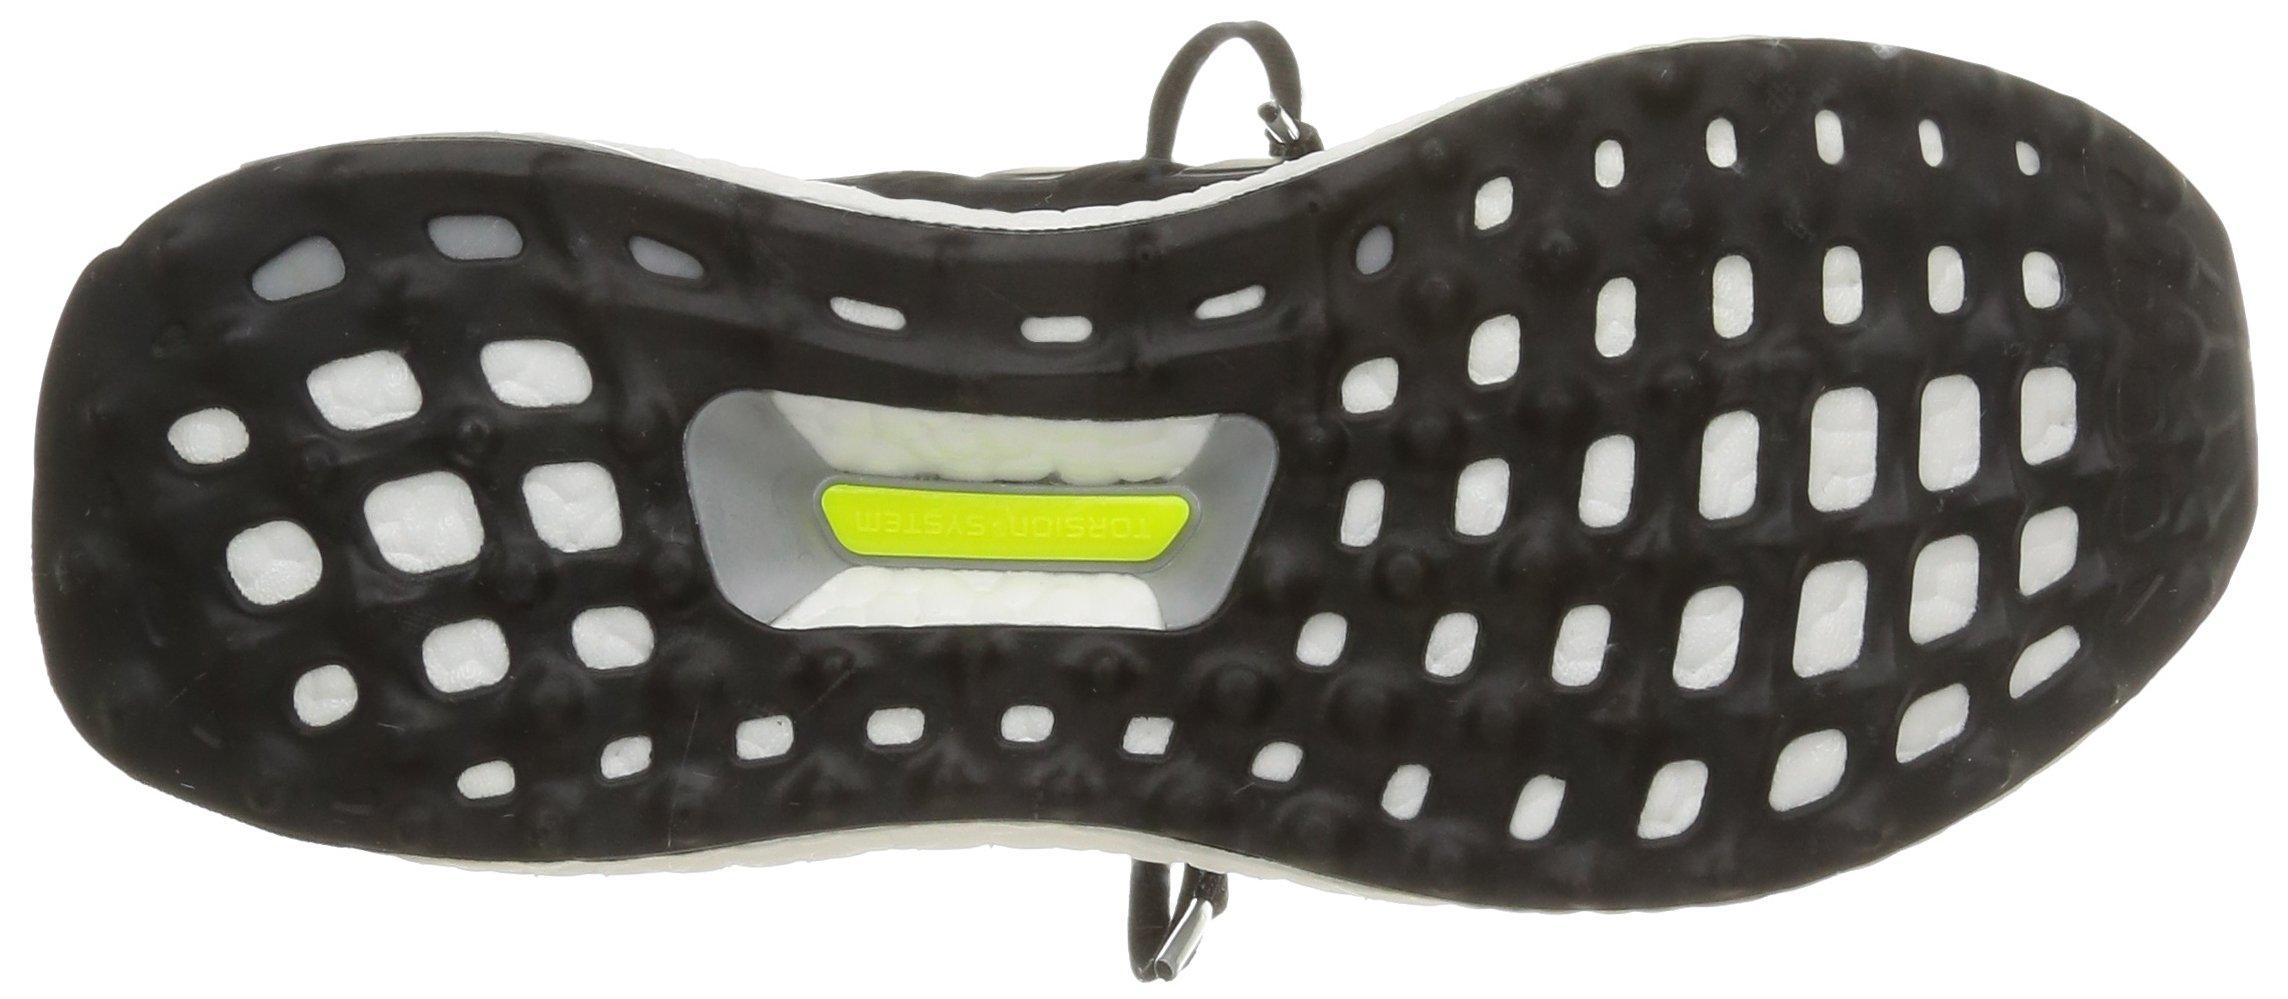 71jn3Qe6GML - adidas Ultra Boost, Women's Running Shoes